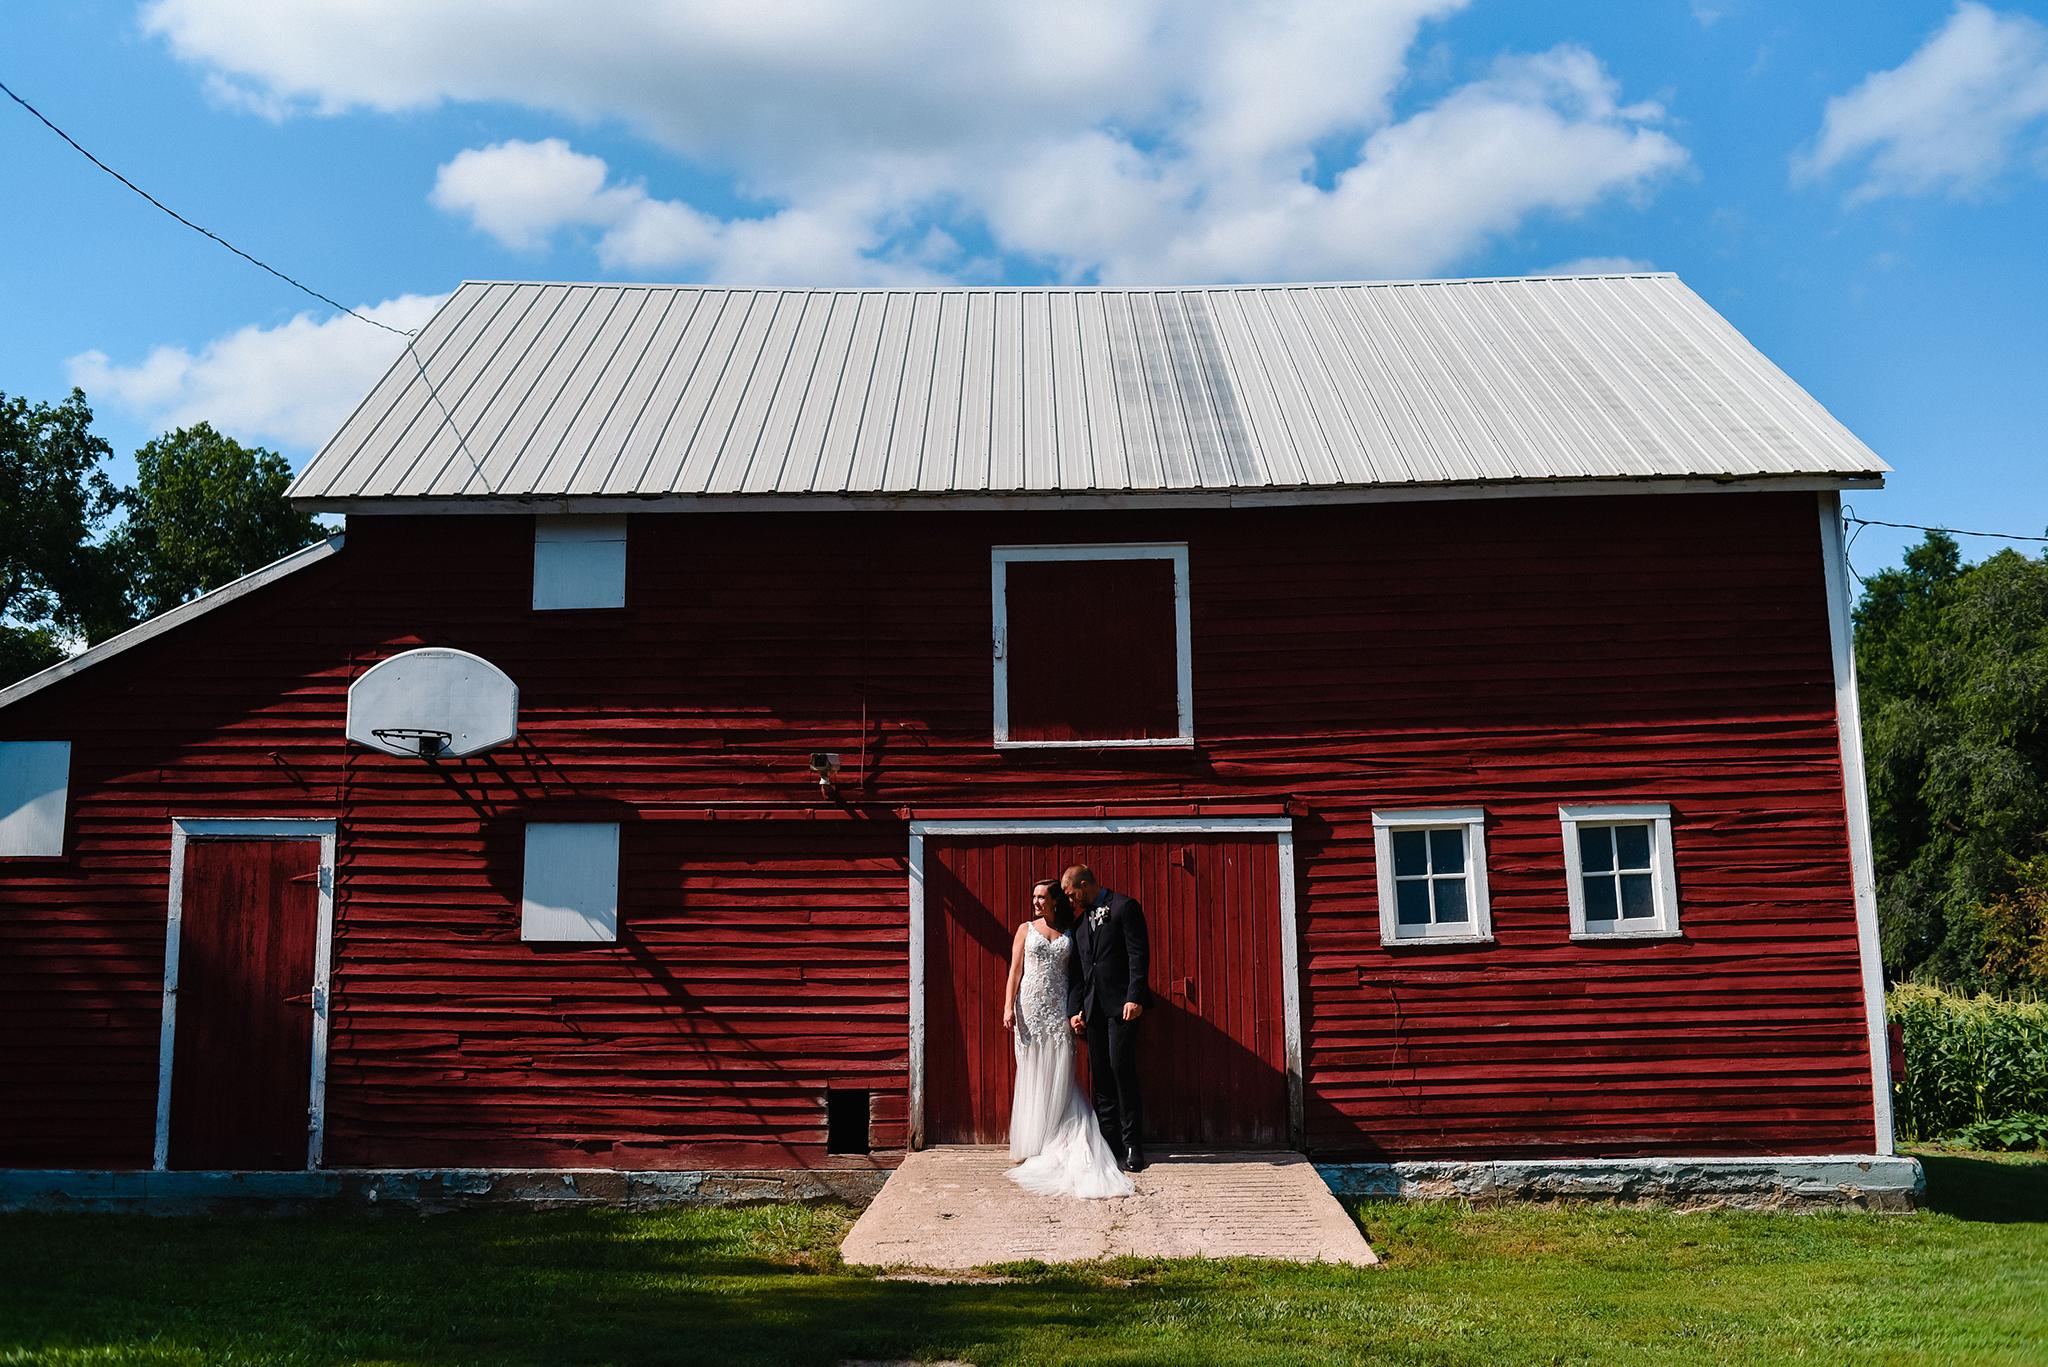 sprinfield-south-dakota-wedding-photographer-jm-studios.jpg